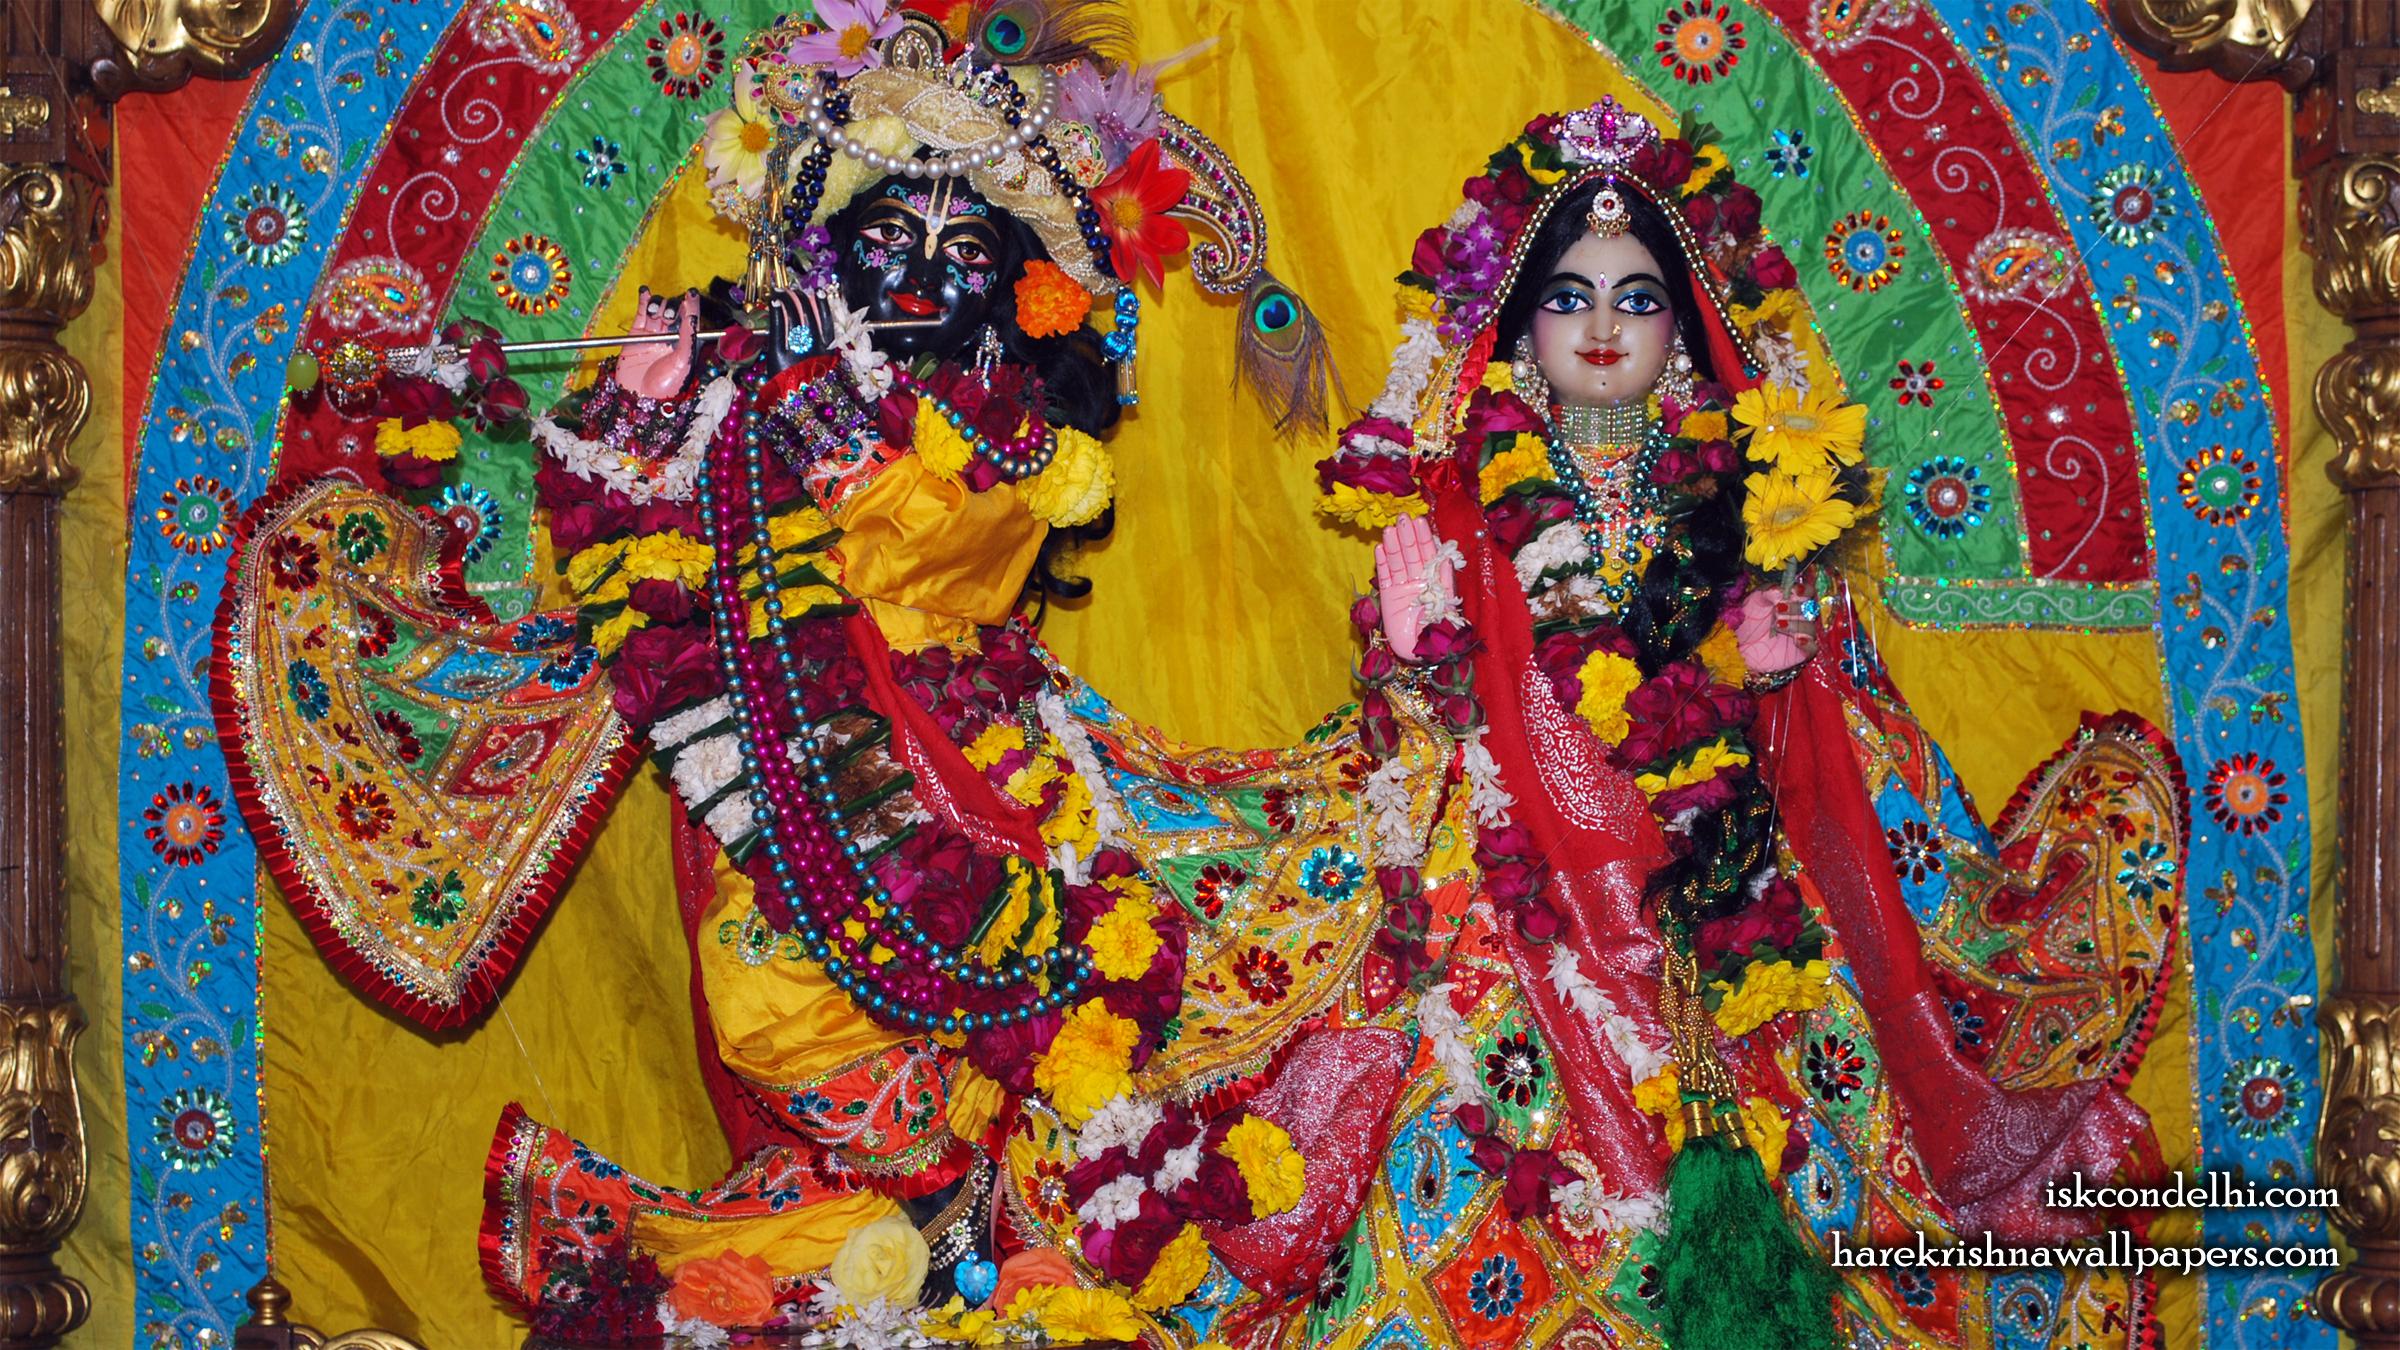 Sri Sri Radha Parthasarathi Wallpaper (011) Size 2400x1350 Download